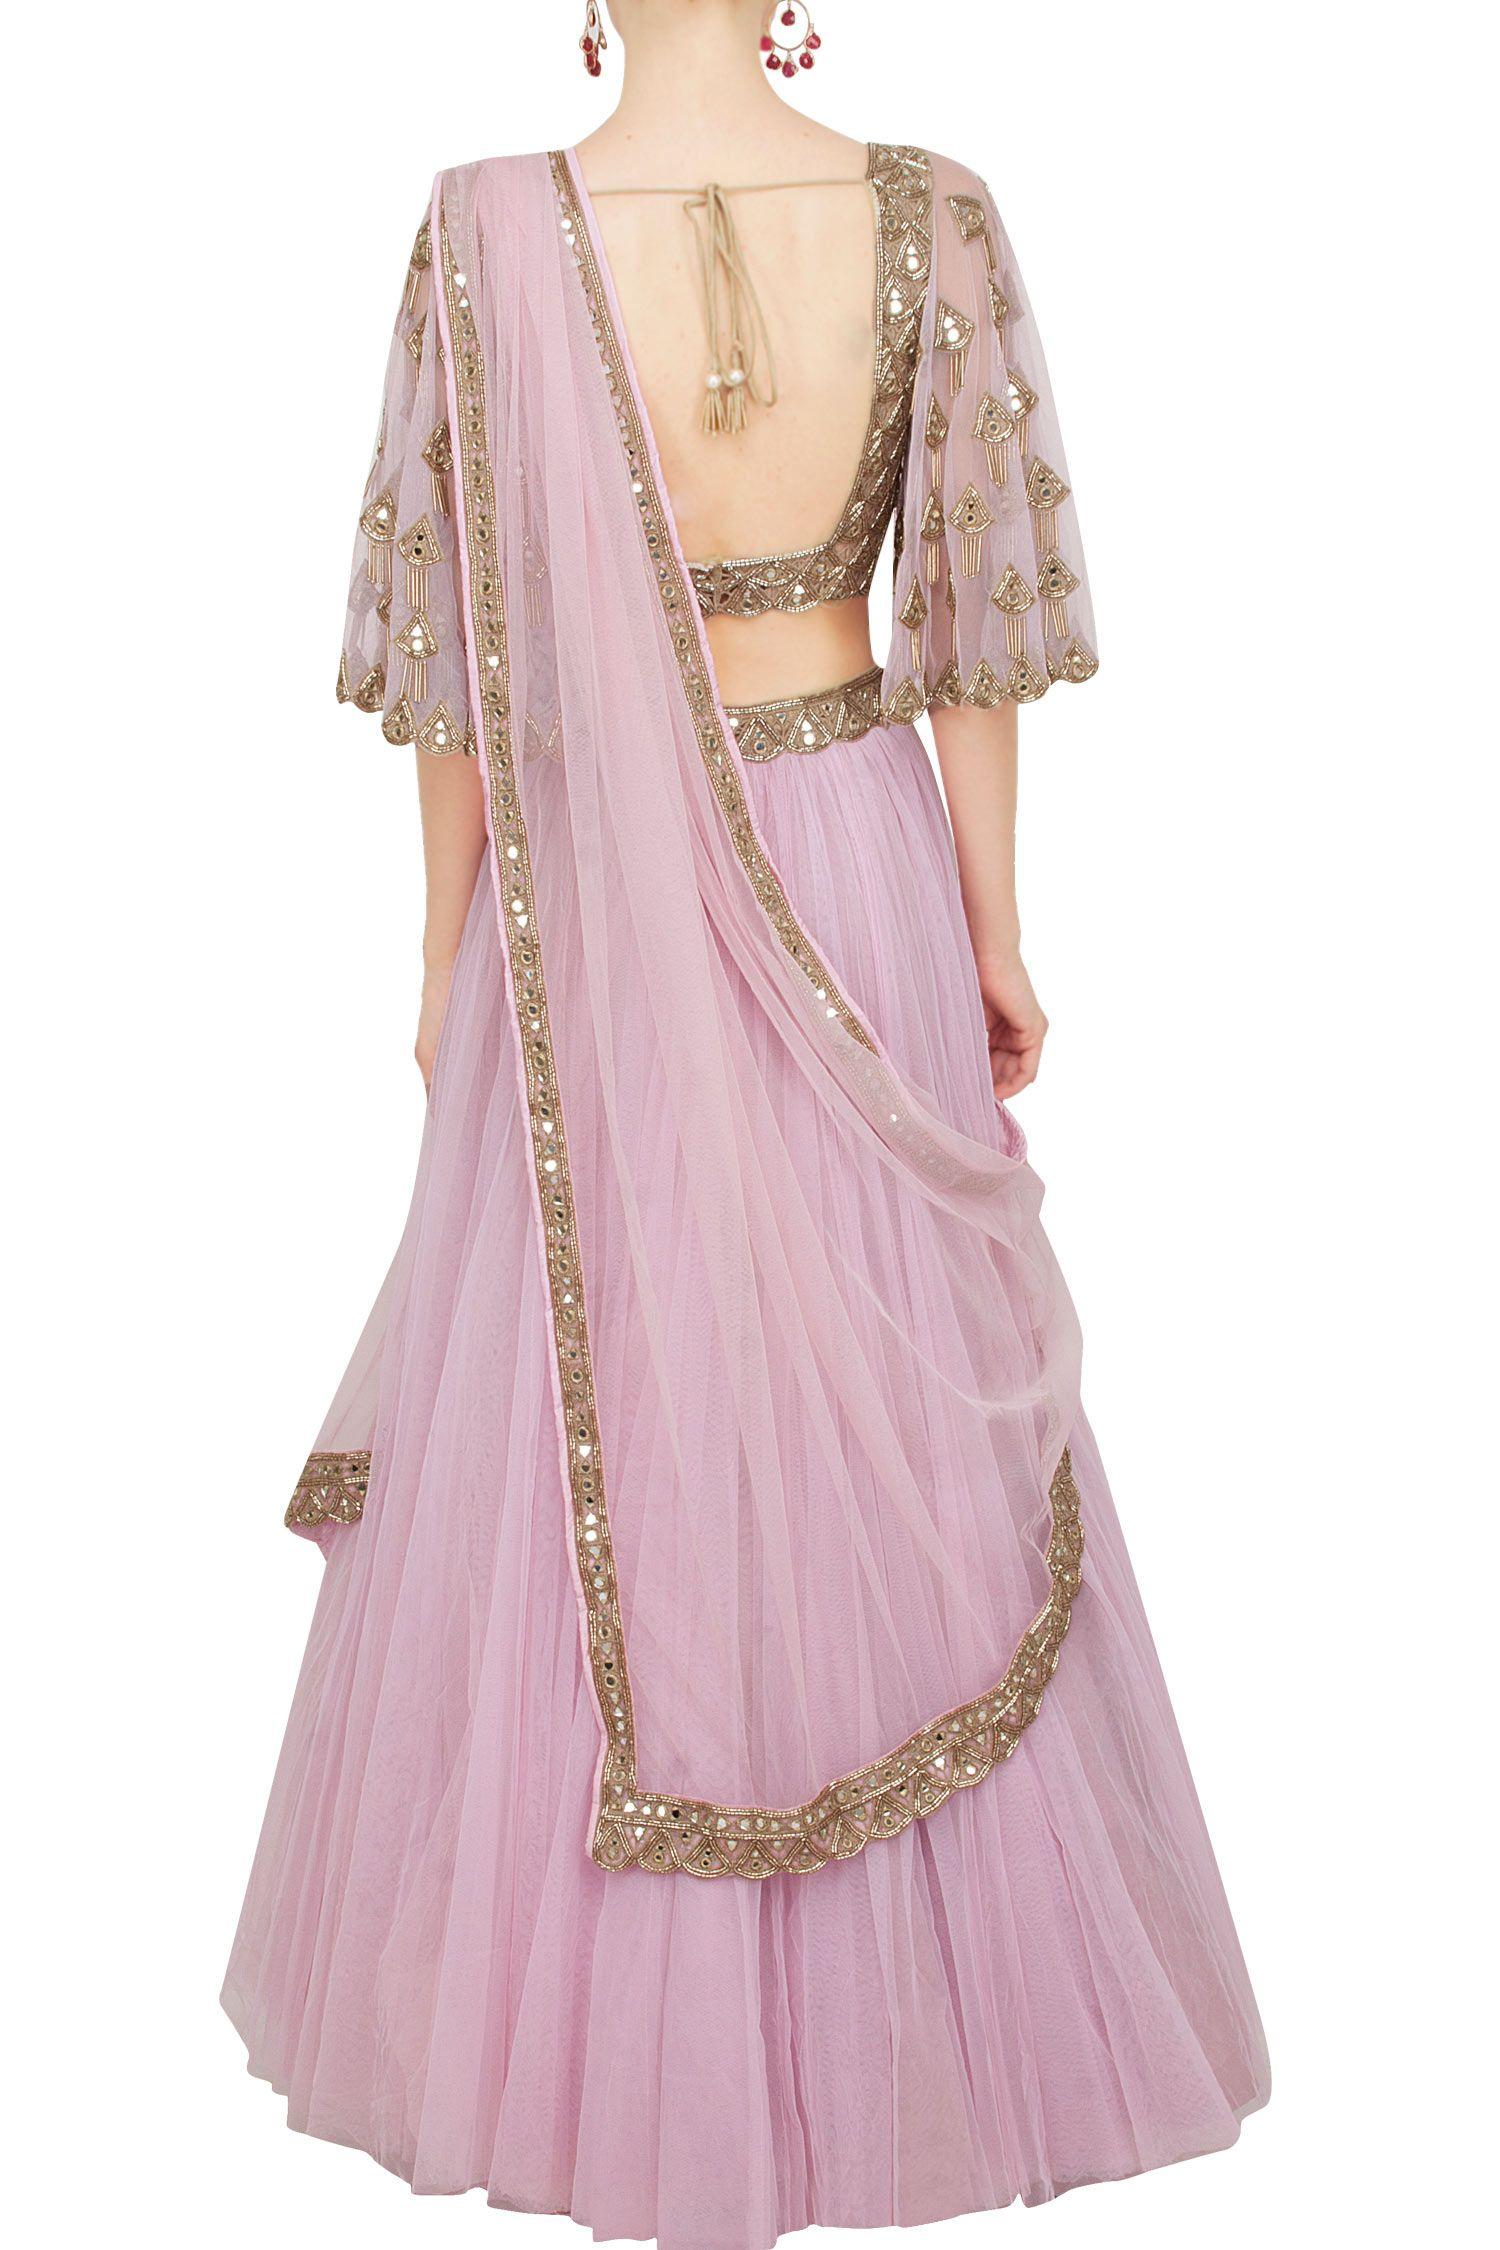 ab6412c0eb16f2 Rose pink lehenga and bell sleeves blouse set | Lehenga designs ...